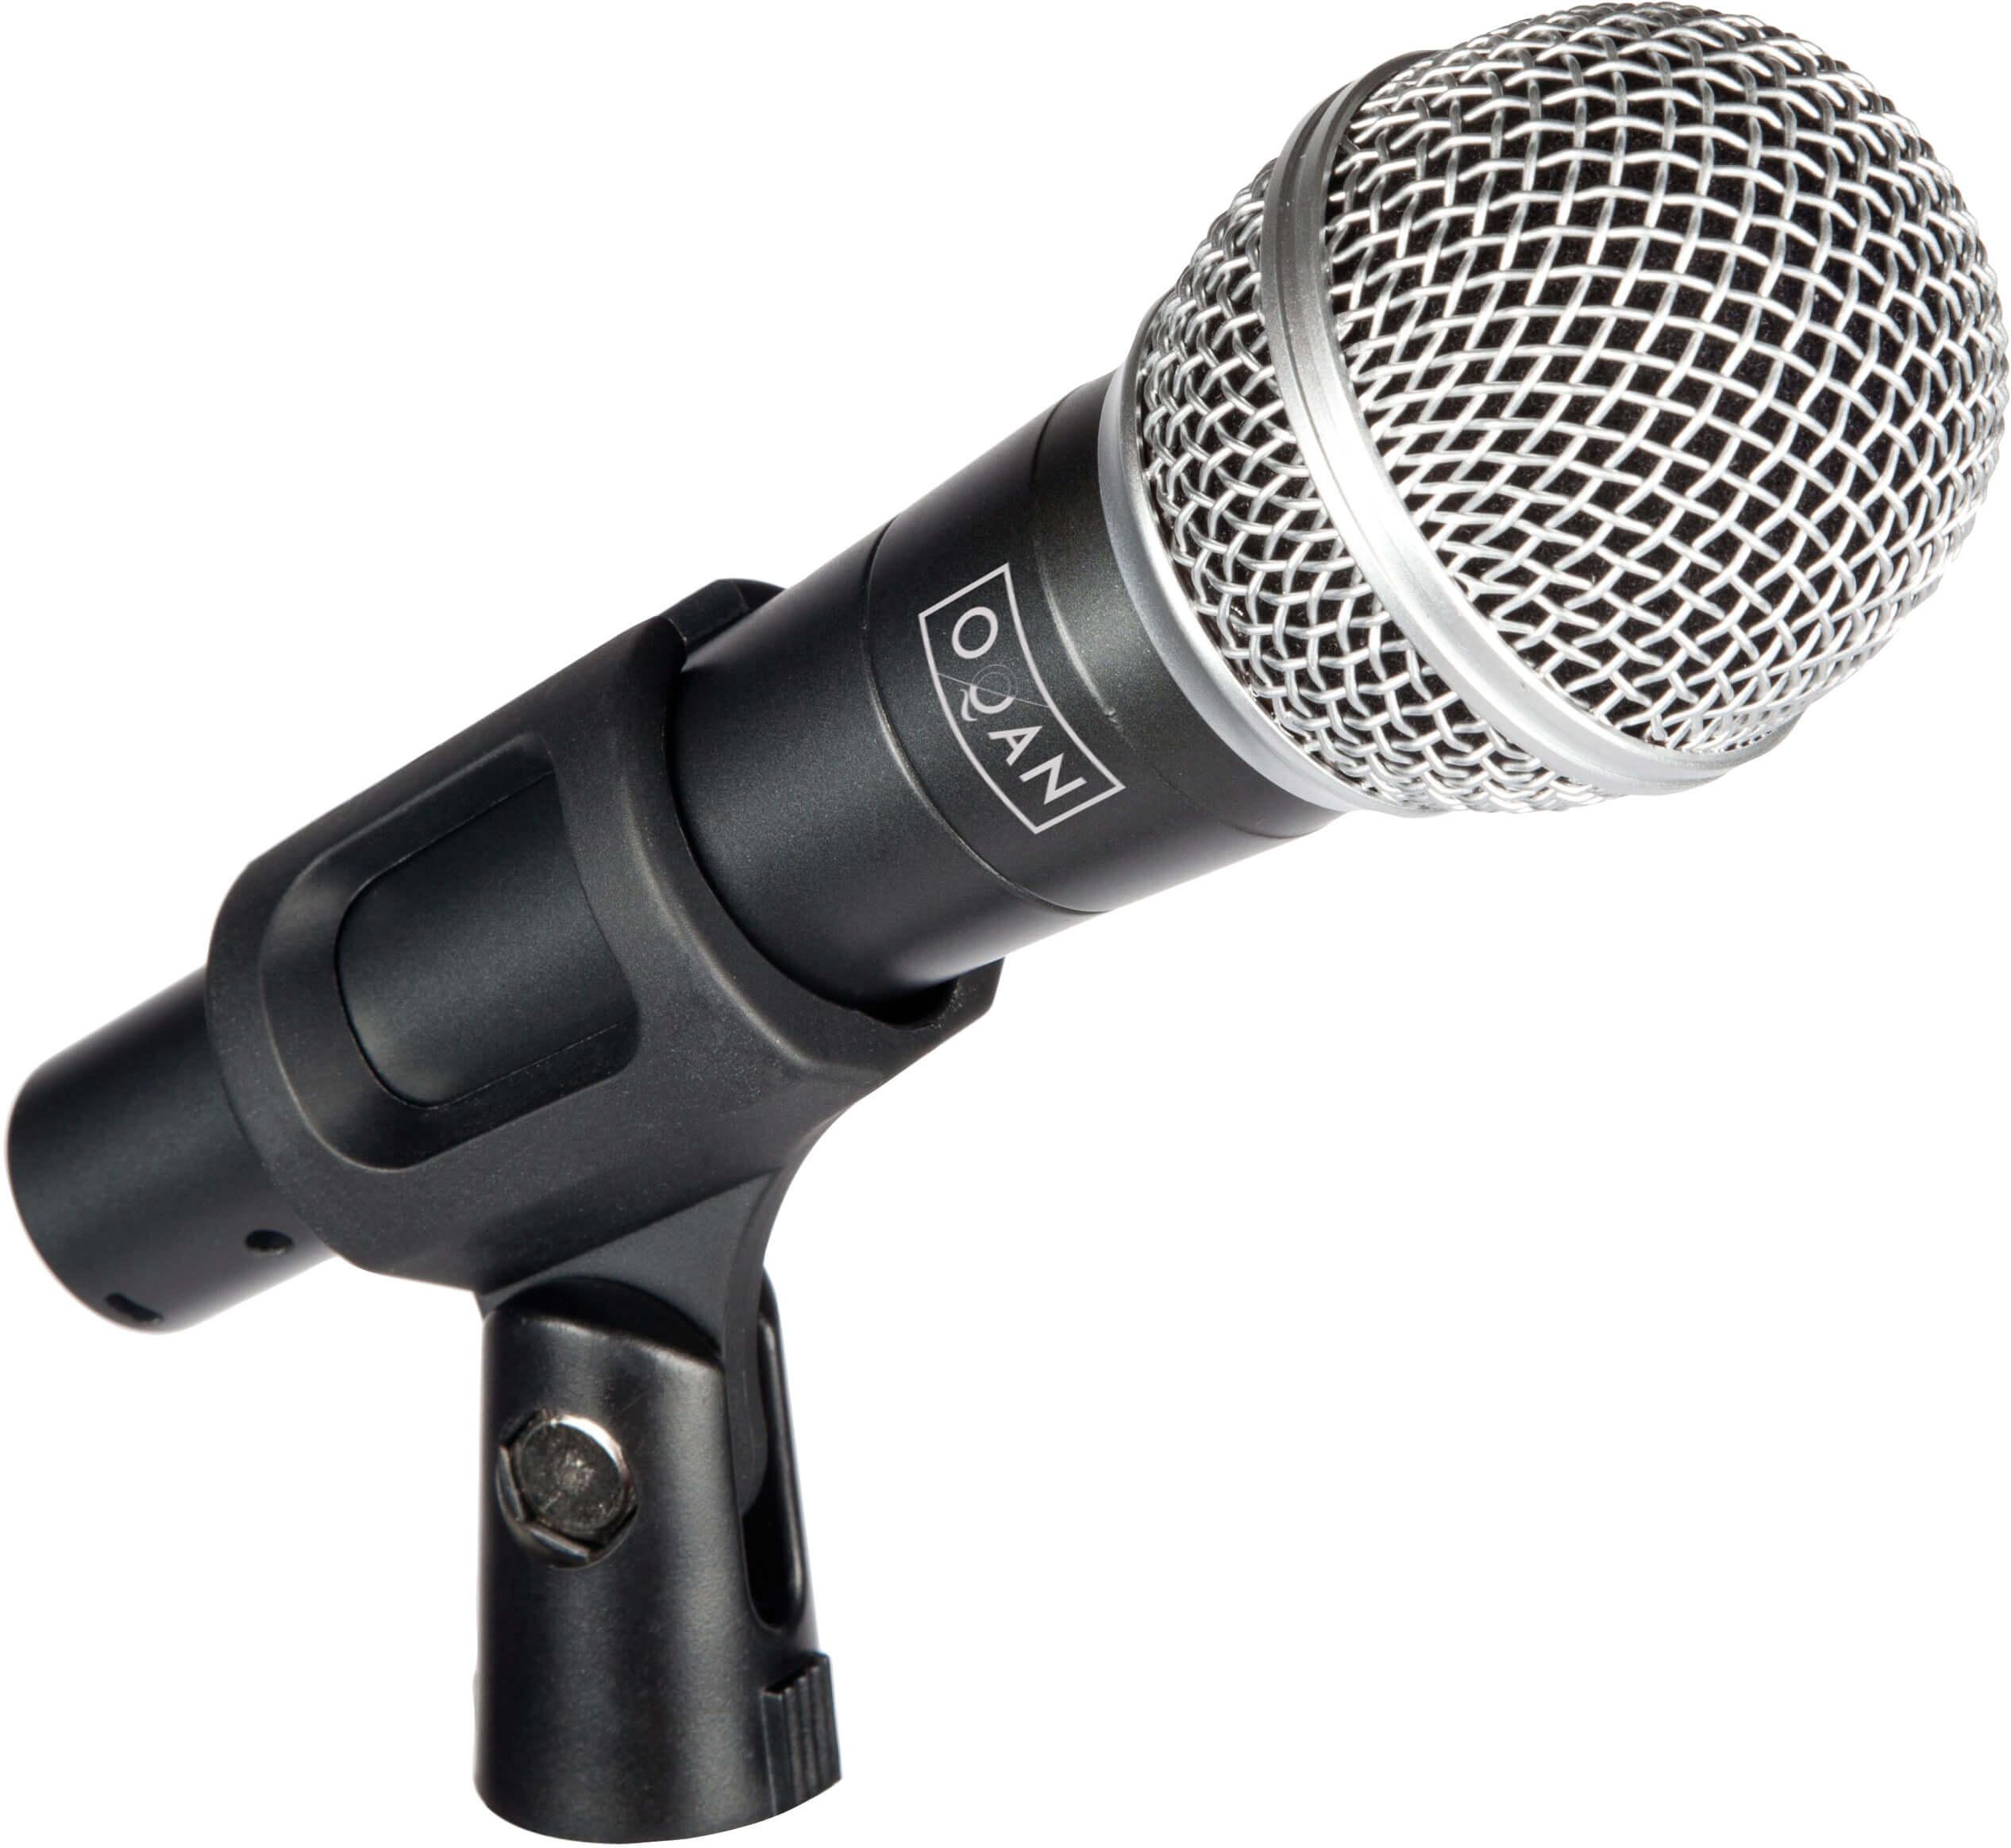 Micrófono Oqan Qmd50 Stage